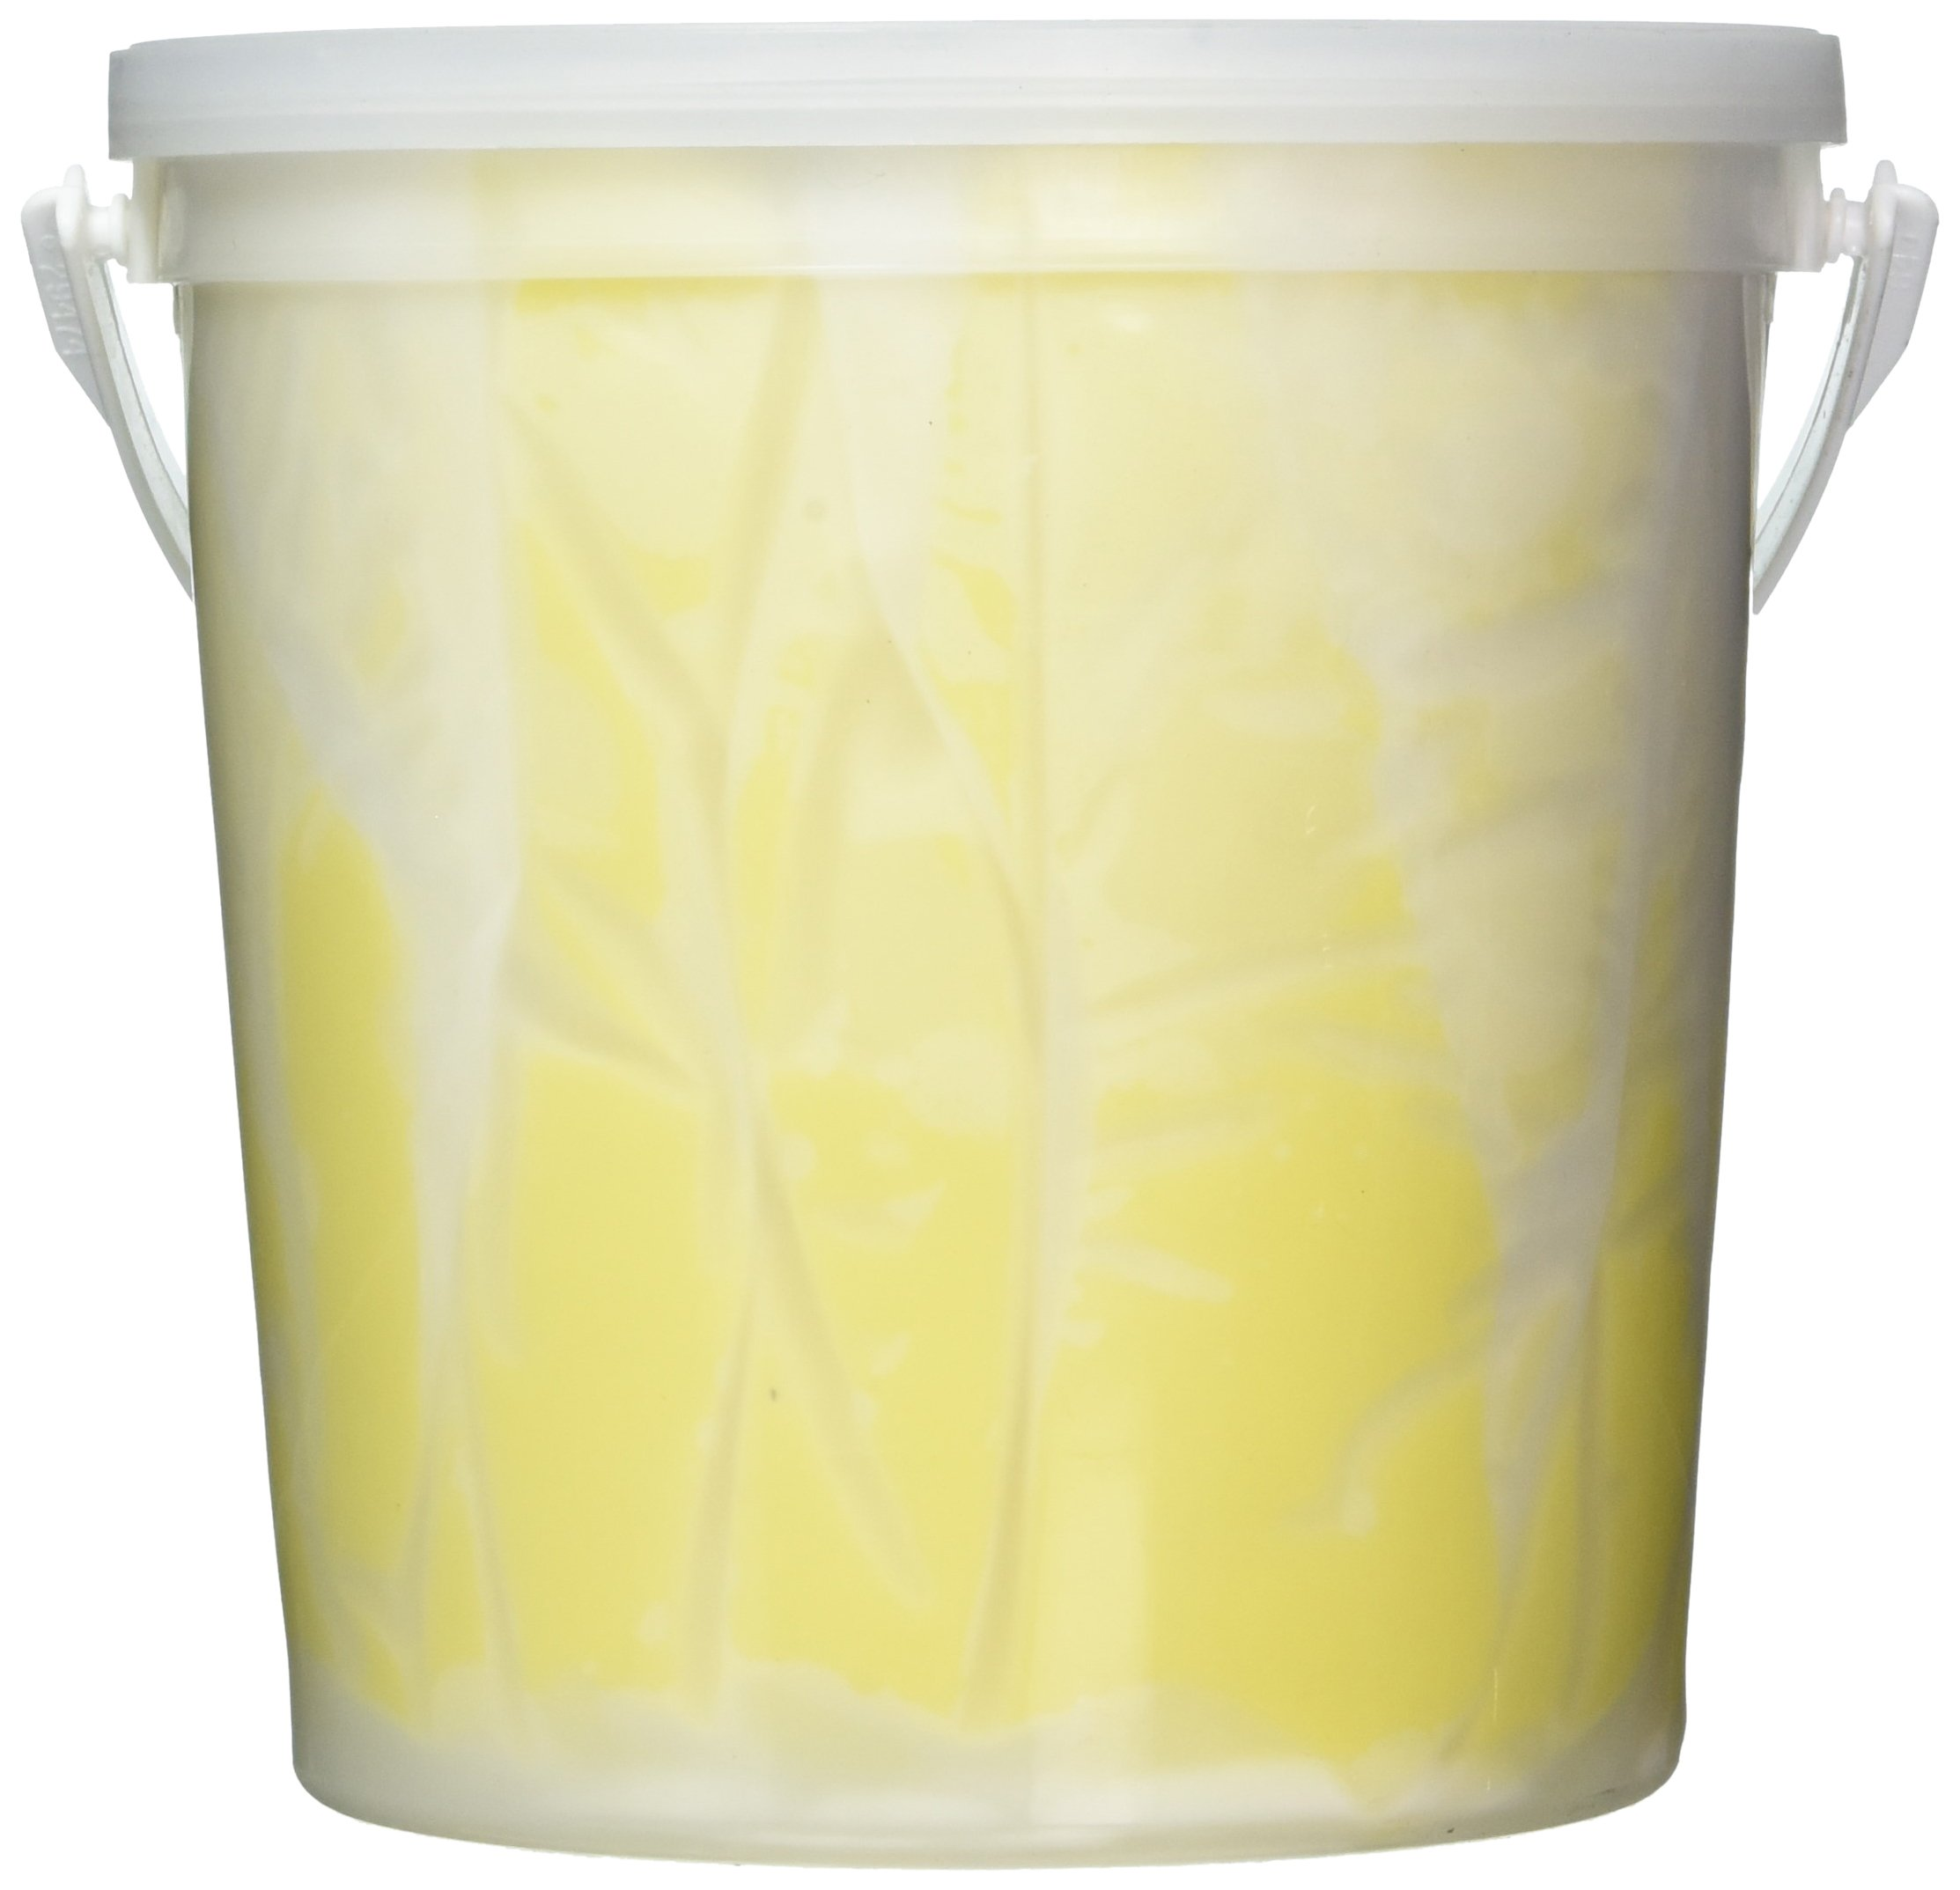 CanDo Sparkle Theraputty, Yellow, X-Soft, 5 Pound